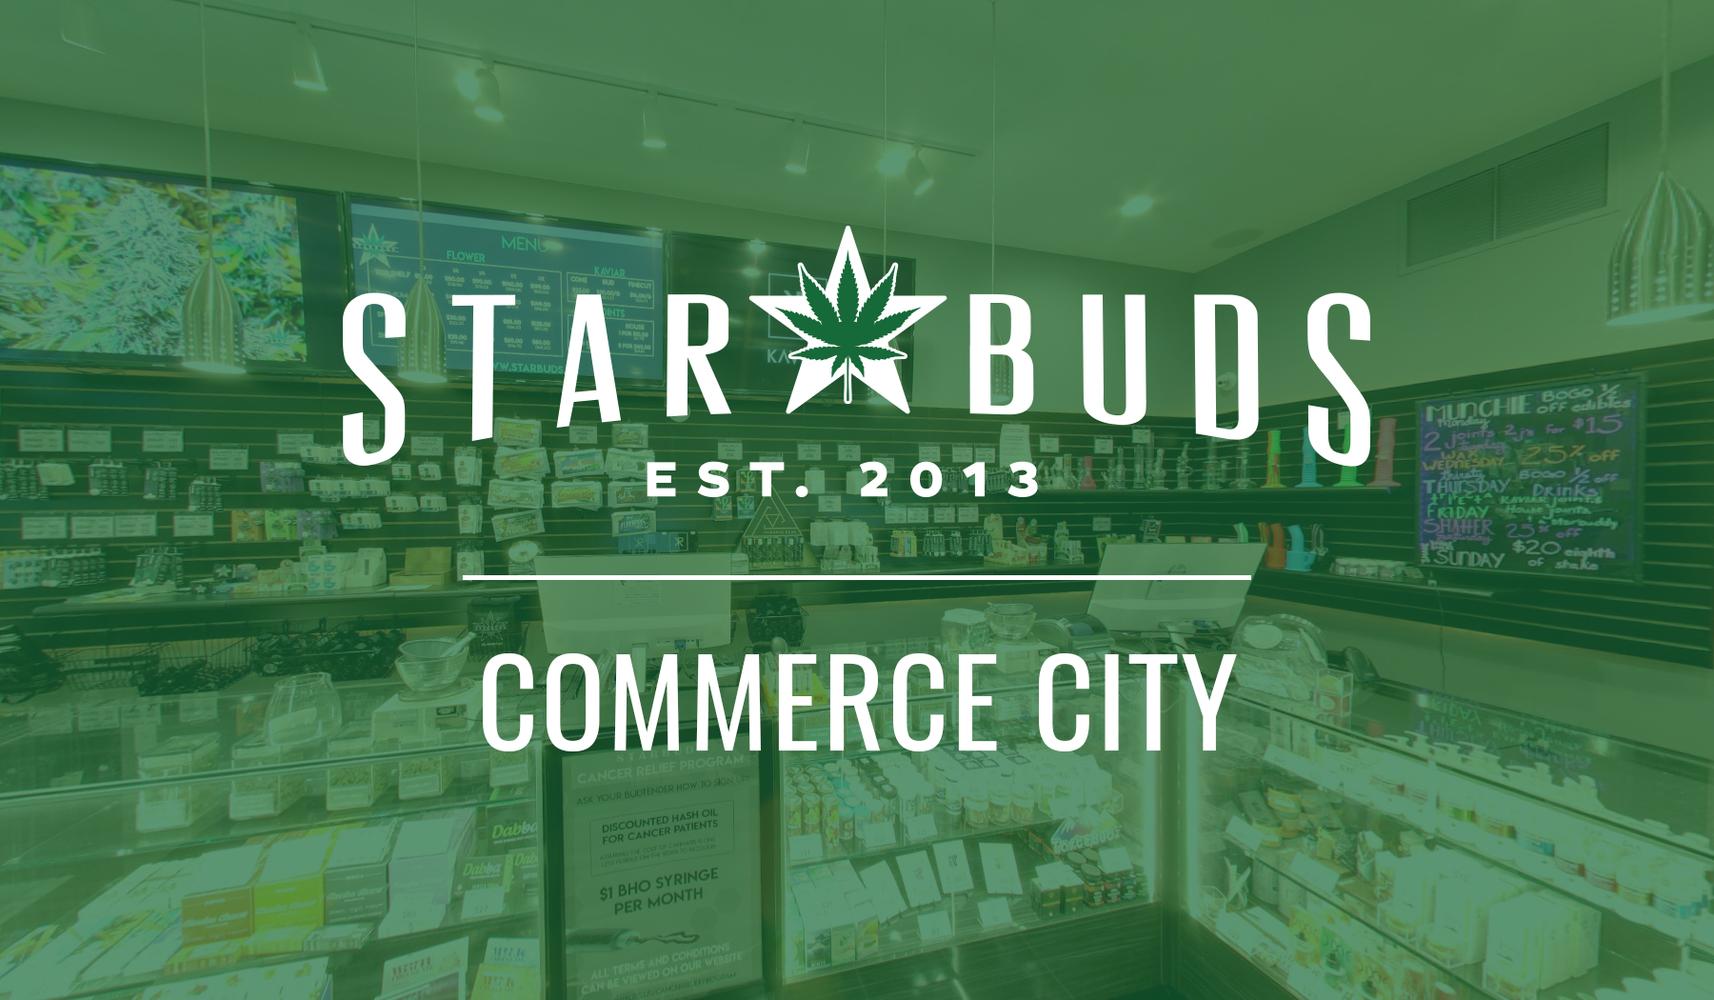 Star Buds Commerce City Recreational Dispensary at Dahlia St